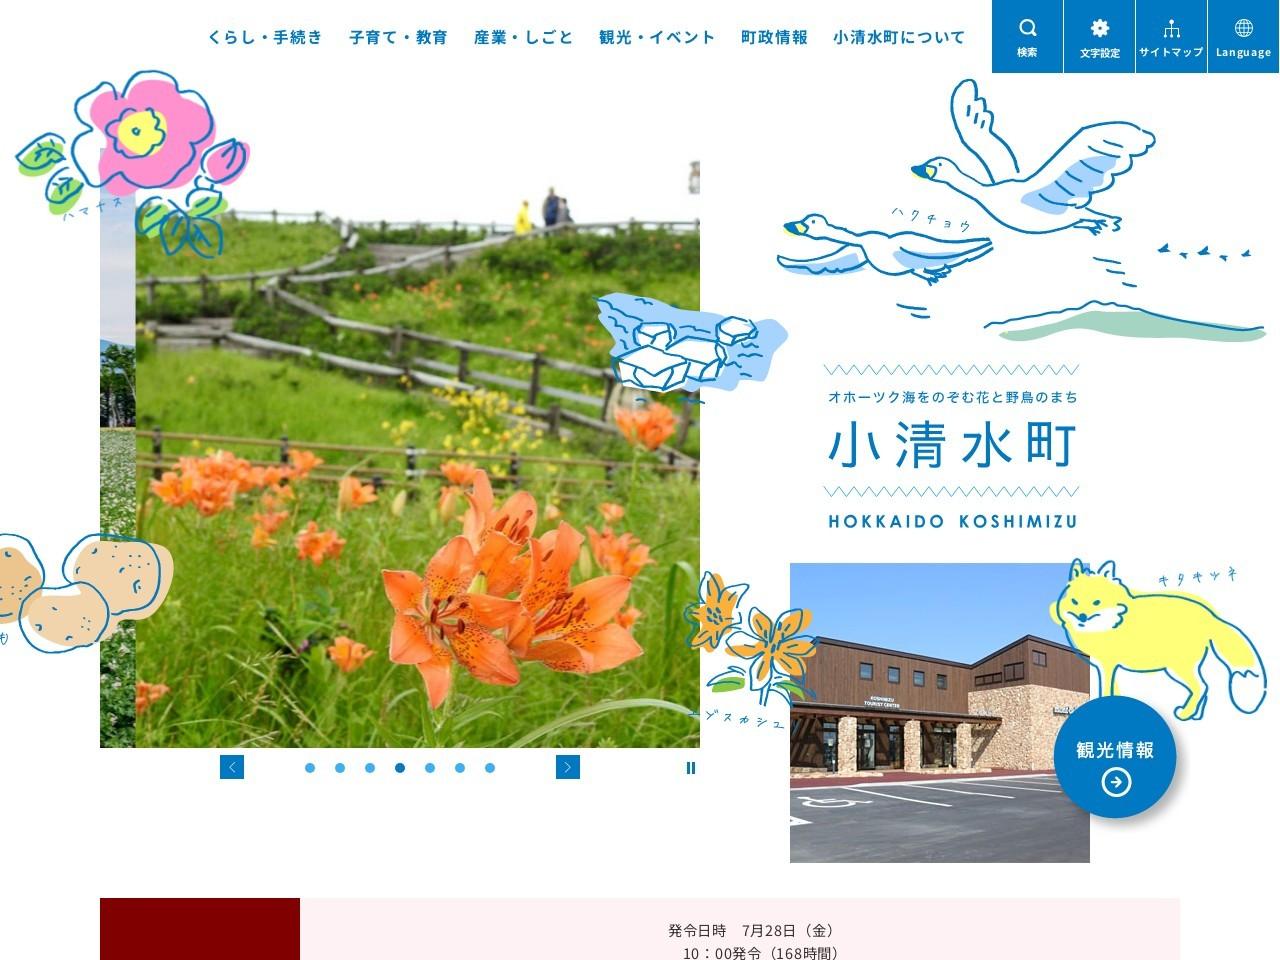 http://www.town.koshimizu.hokkaido.jp/hotnews/detail/00002684.html